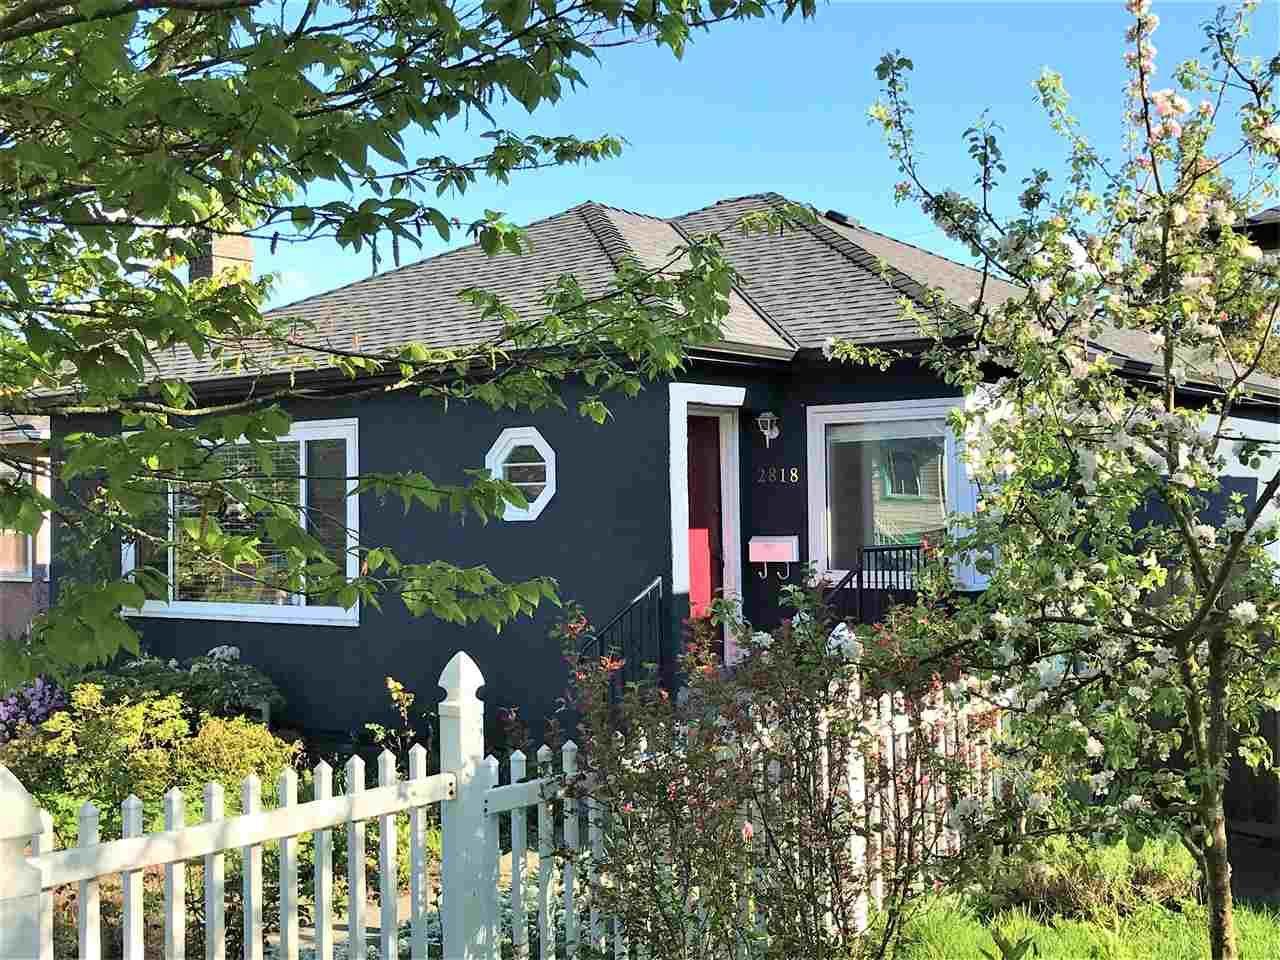 Main Photo: 2818 ADANAC Street in Vancouver: Renfrew VE House for sale (Vancouver East)  : MLS®# R2573635